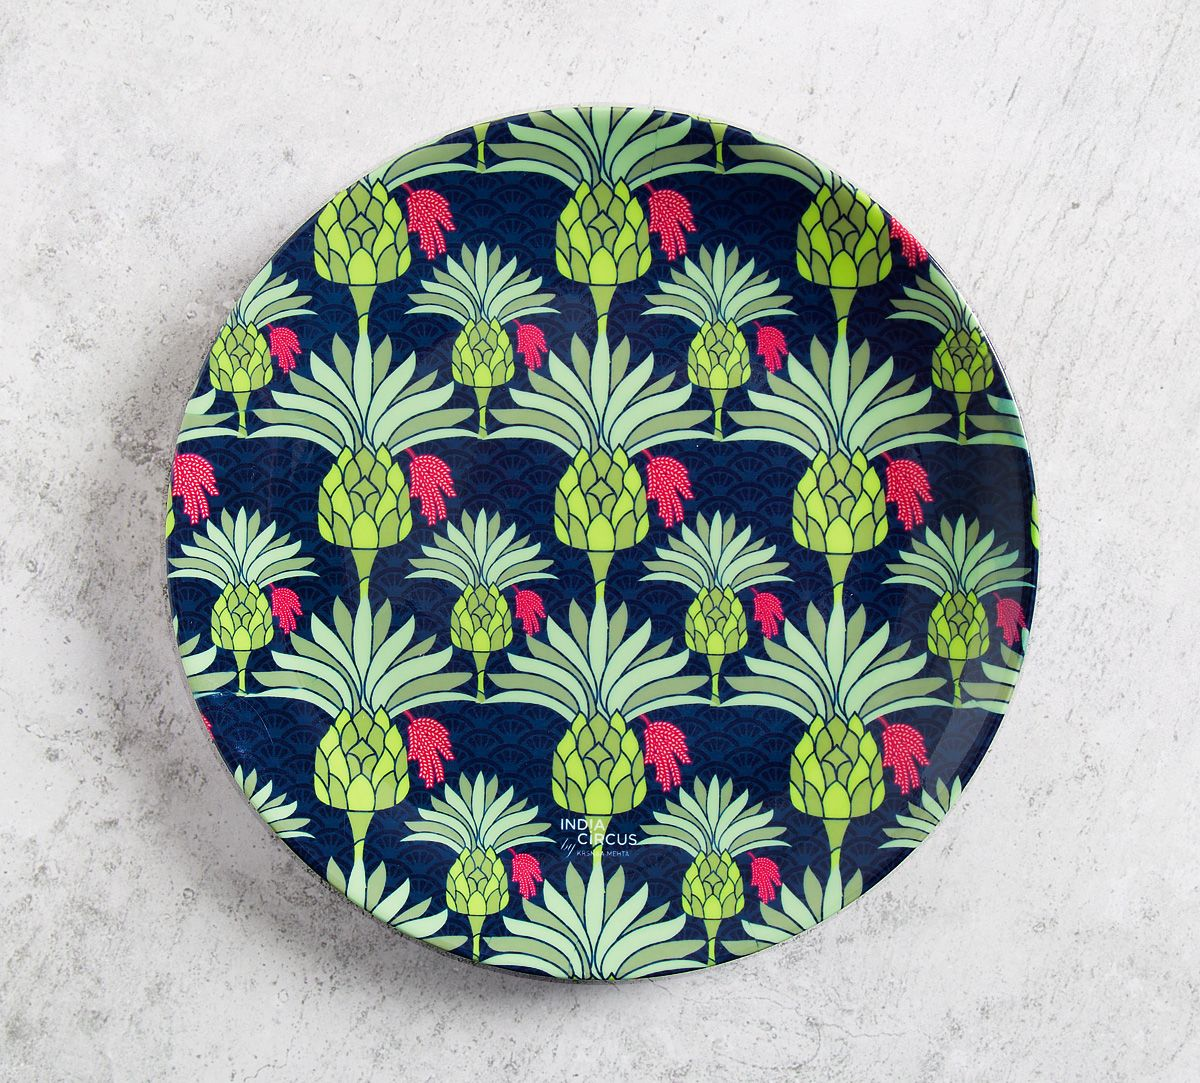 Palmeira Reiteration 8 inch Decorative and Snacks Platter